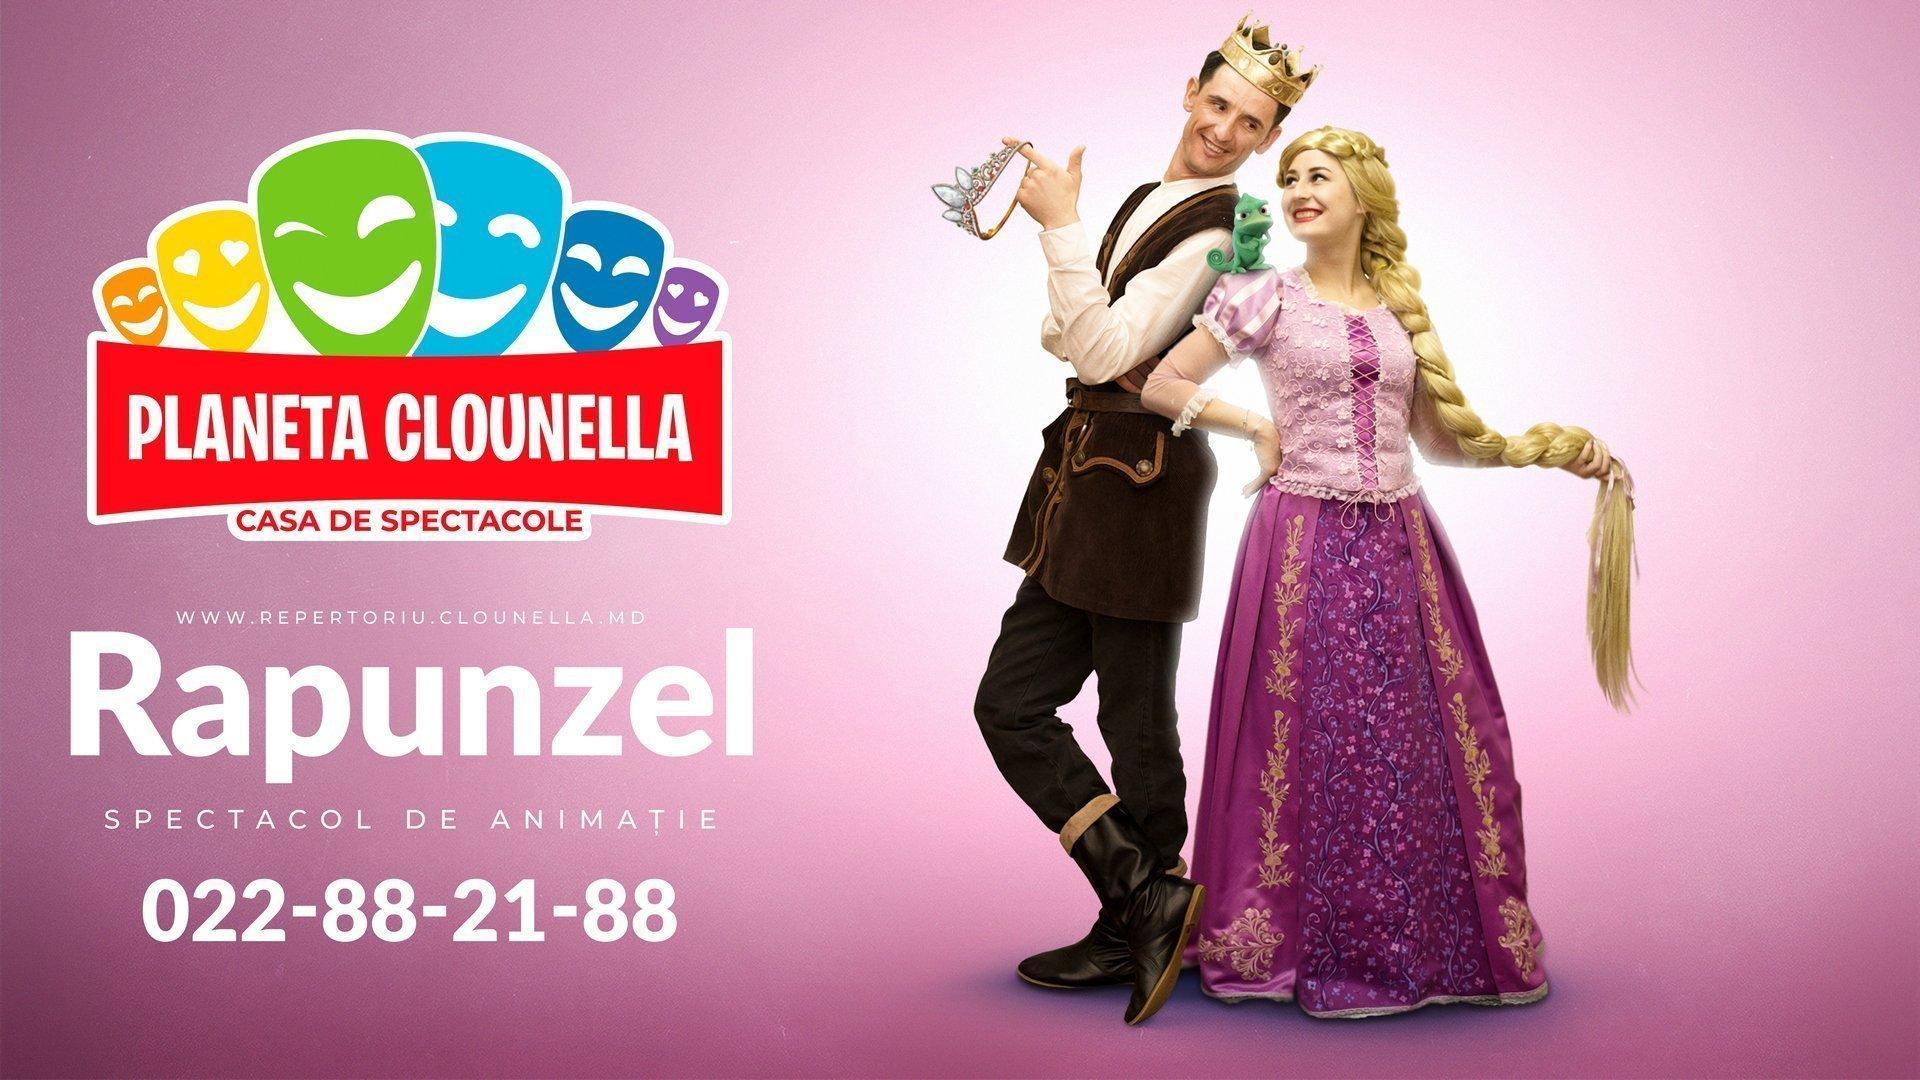 Rapunzel- Spectacol Interactiv de Animatie pentru copii | Iulie 2019 | +3